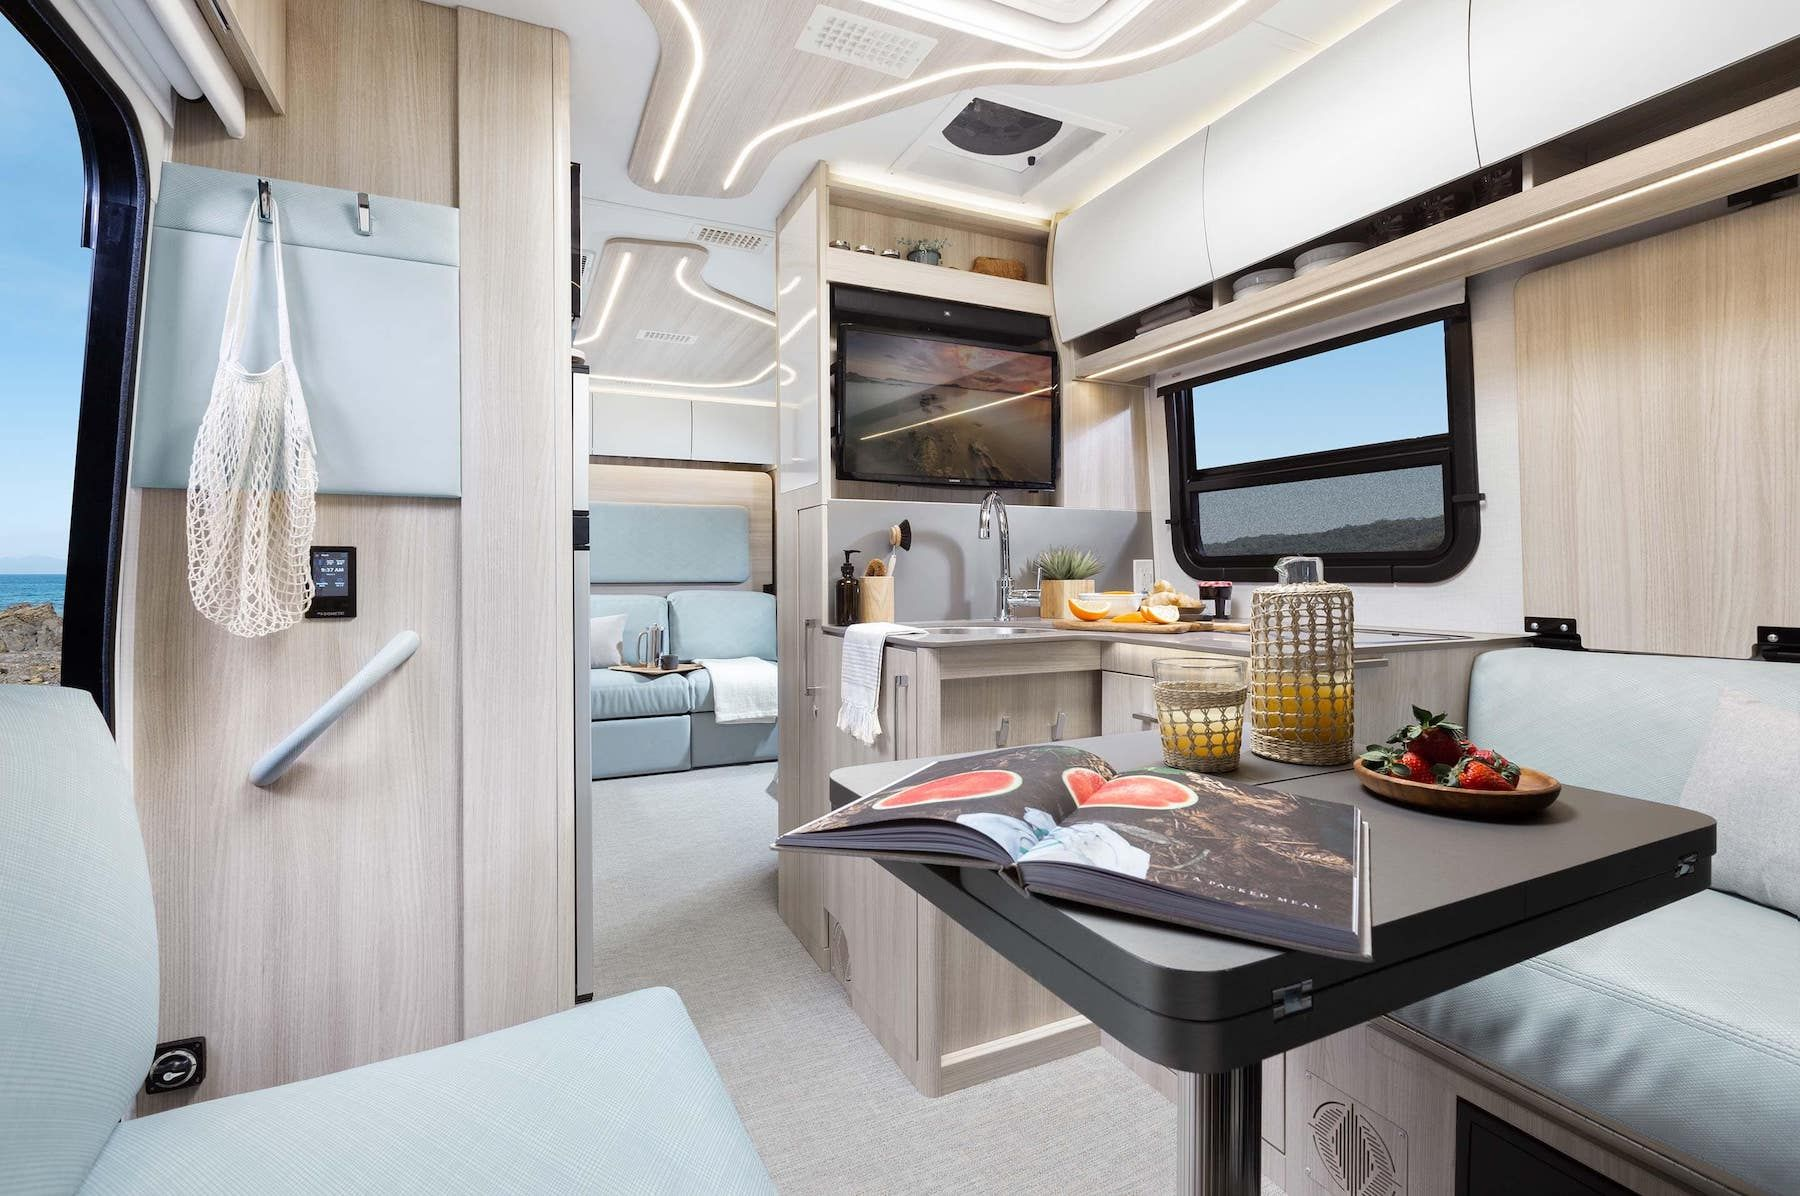 Unity Rear Lounge Leisure travel vans, Murphy bed